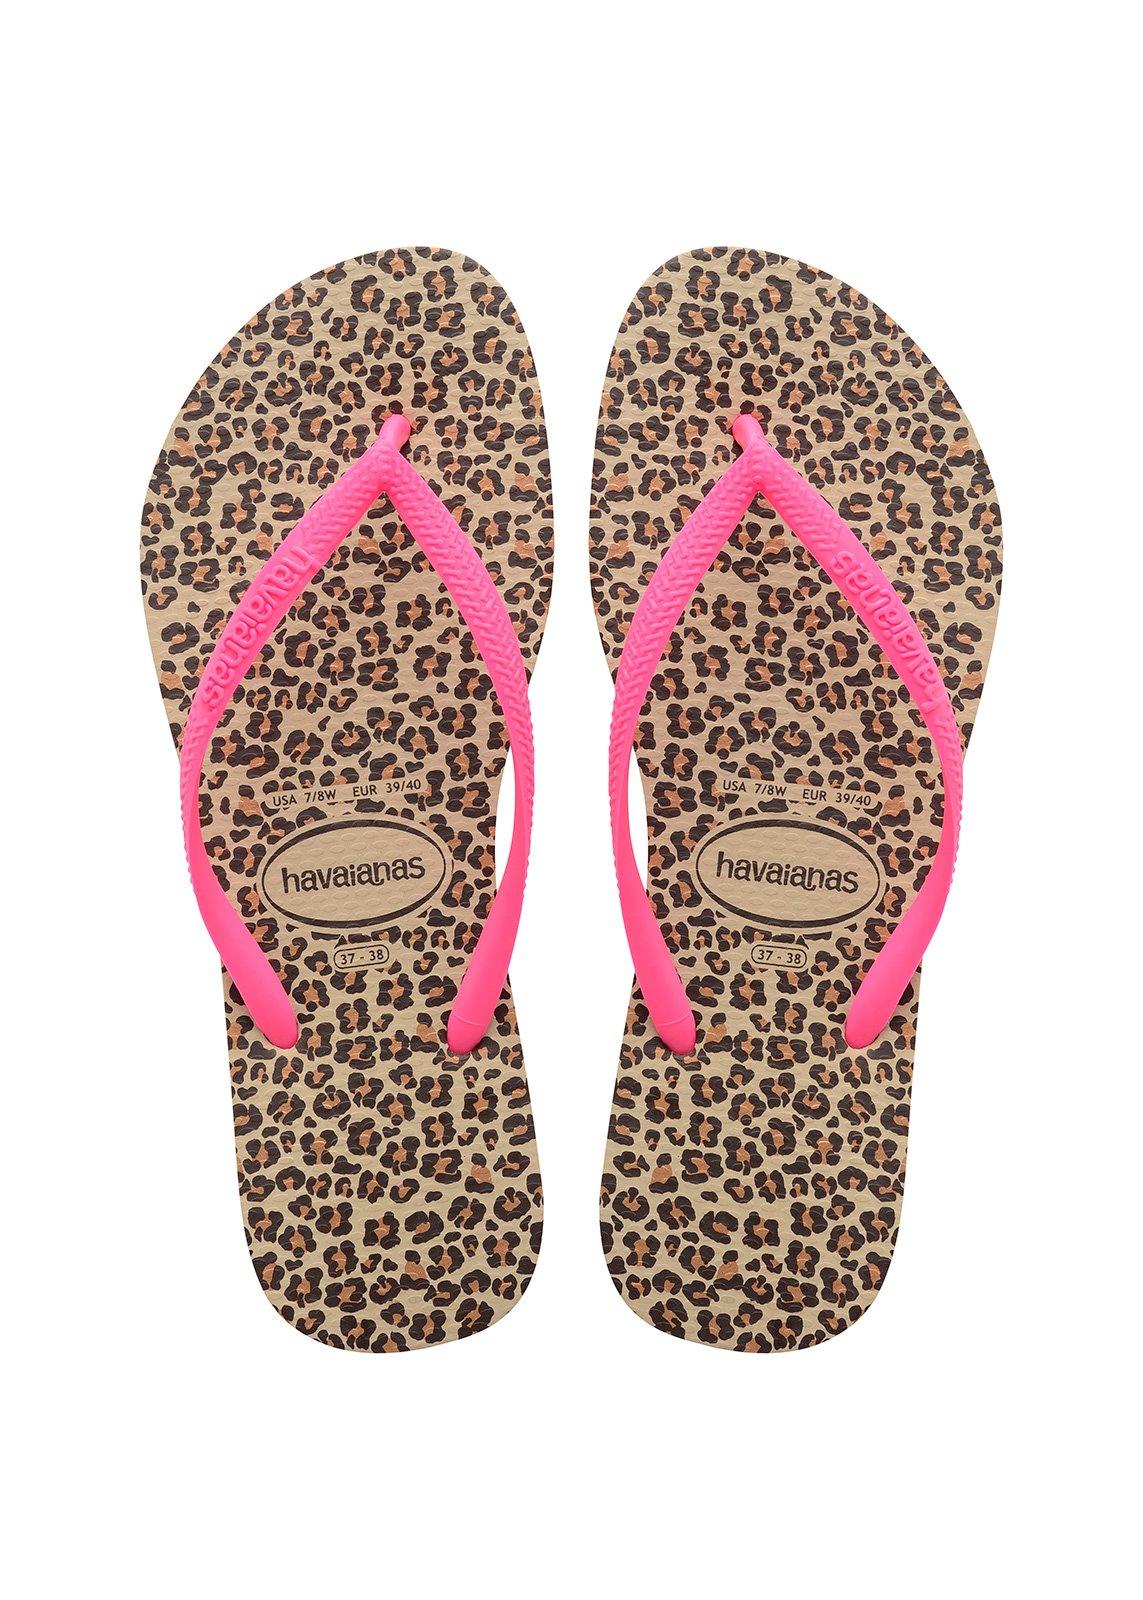 3771d2b5e77fab Flip-Flops Flip-flops - Havaianas Slim Animals Sandgrey pink